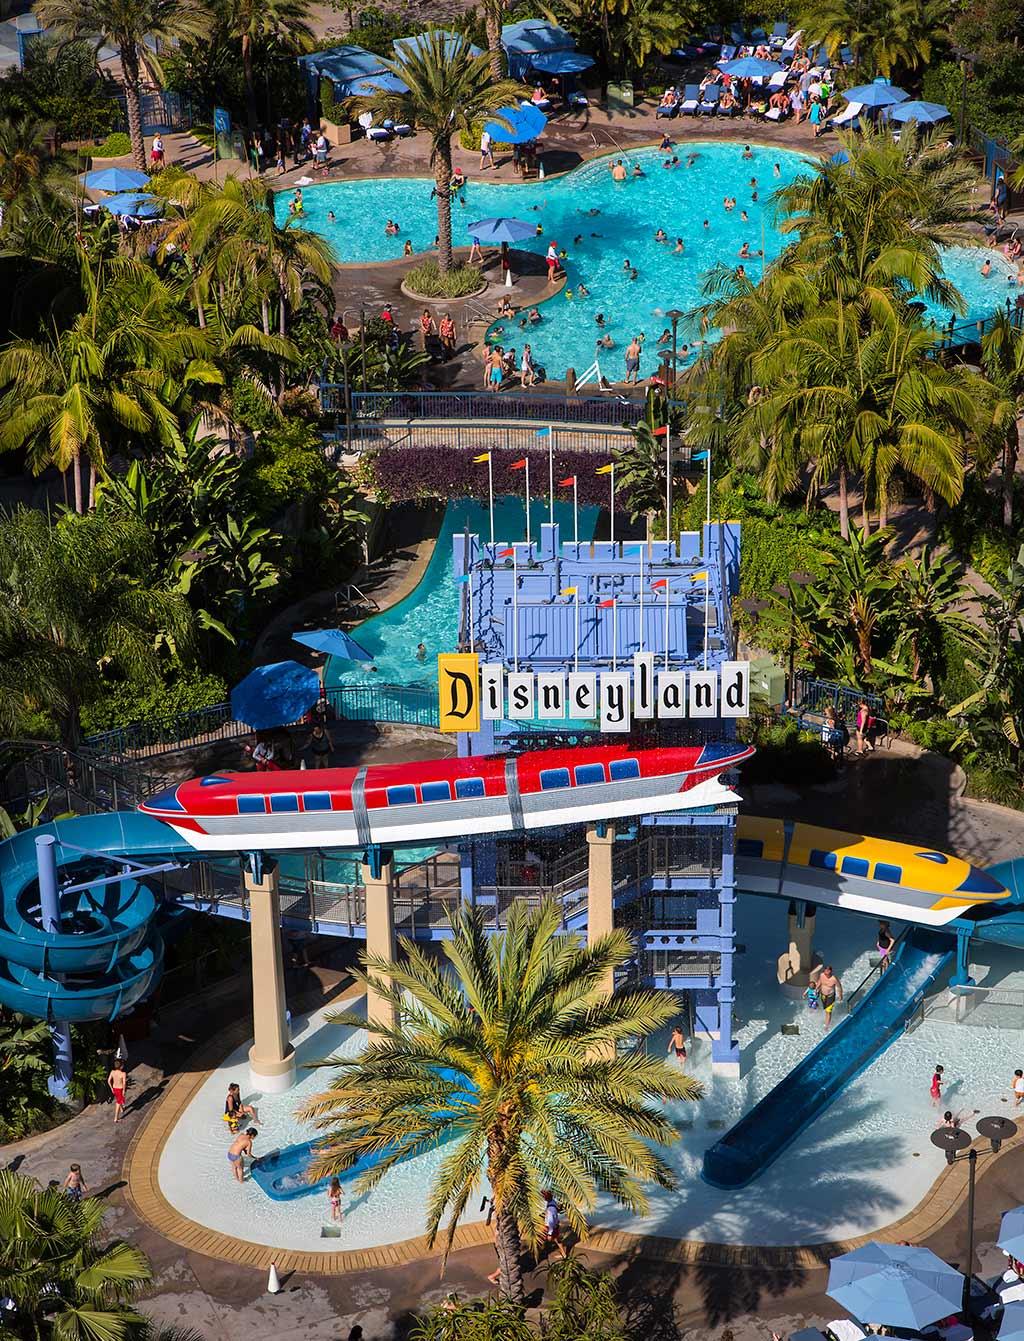 Monorail slide at the Disneyland Resort's Disneyland Hotel pool